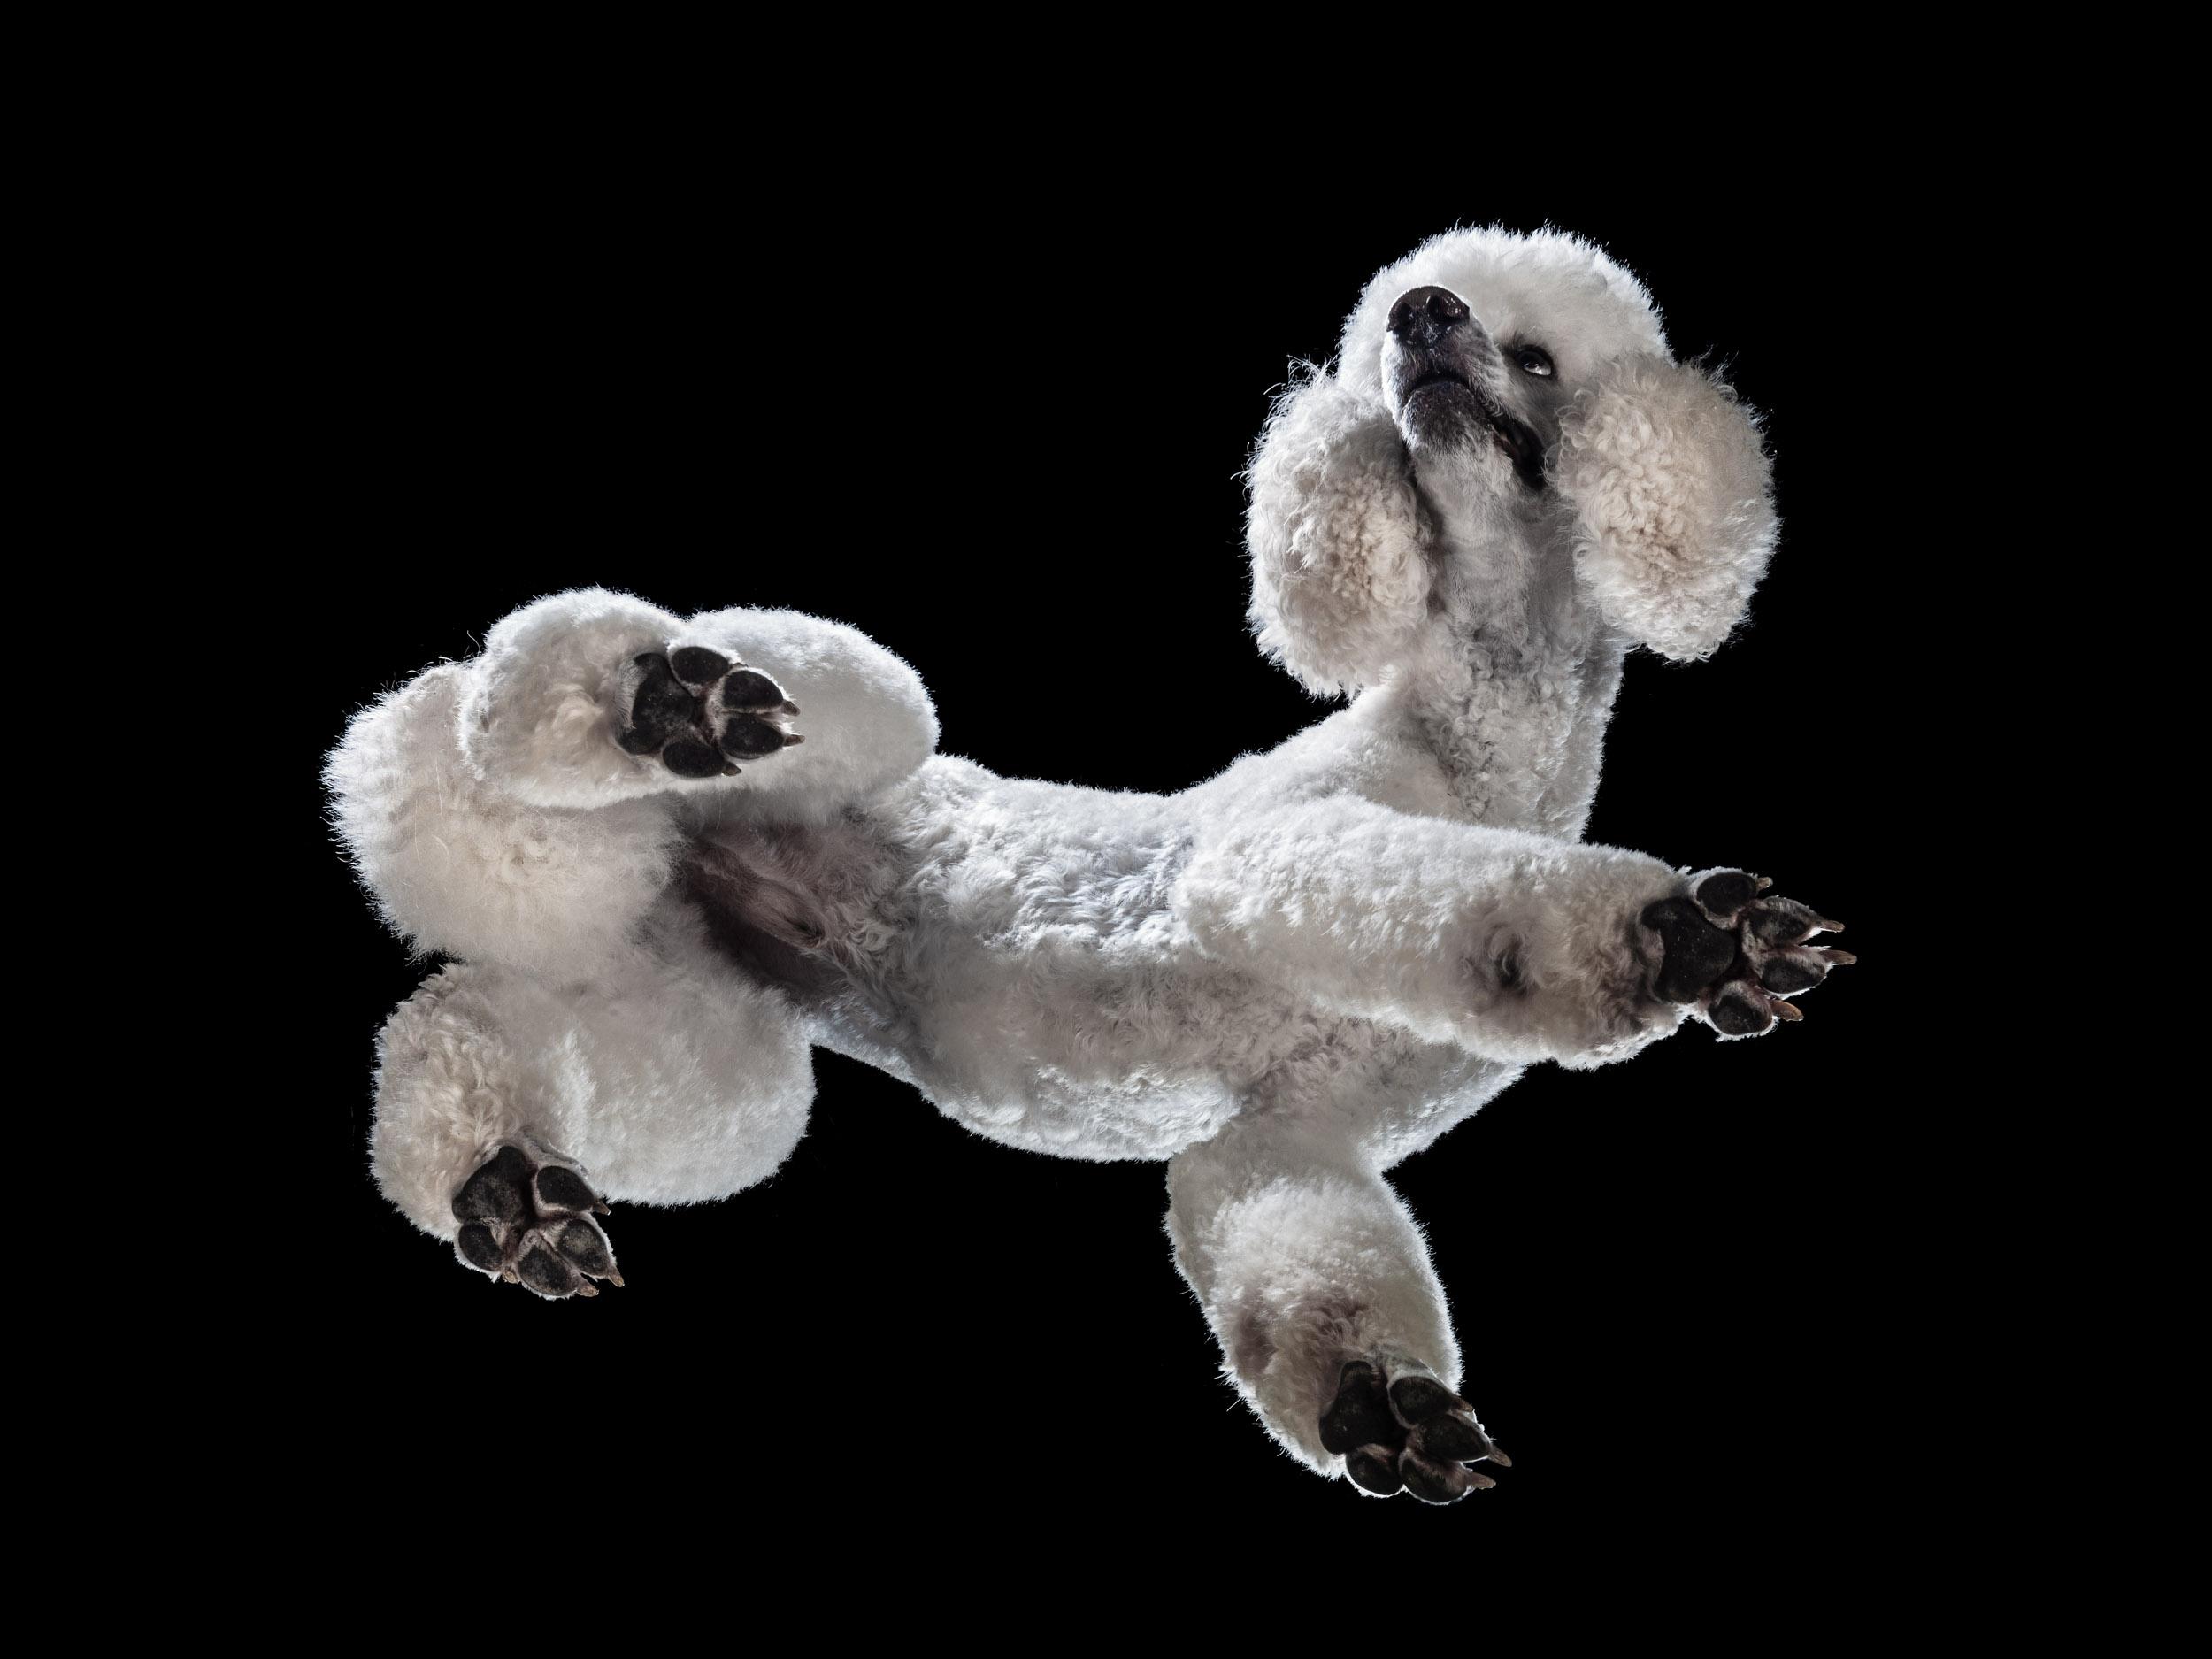 Hund, Pudel